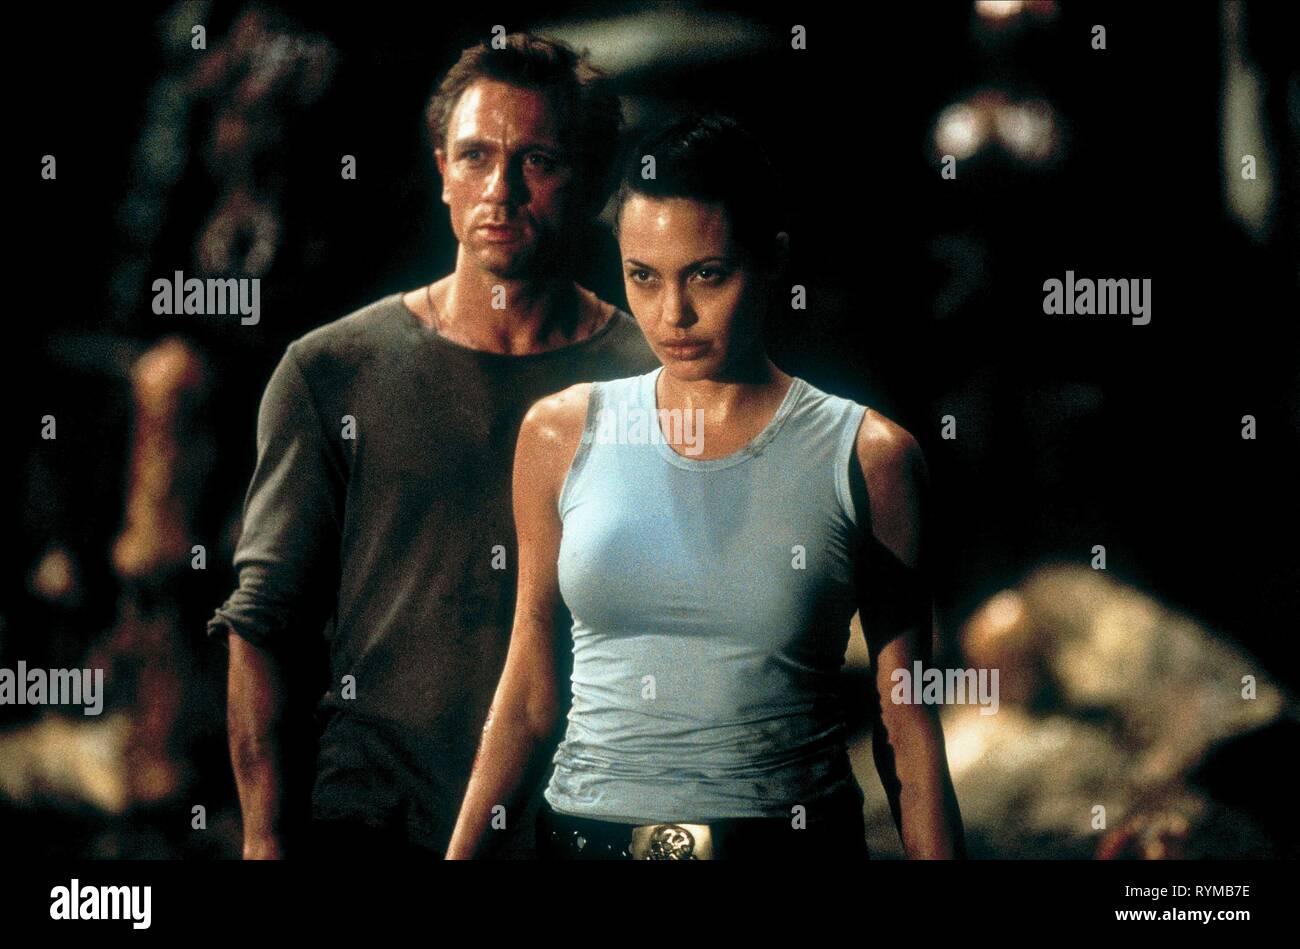 CRAIG,JOLIE, LARA CROFT: TOMB RAIDER, 2001 - Stock Image